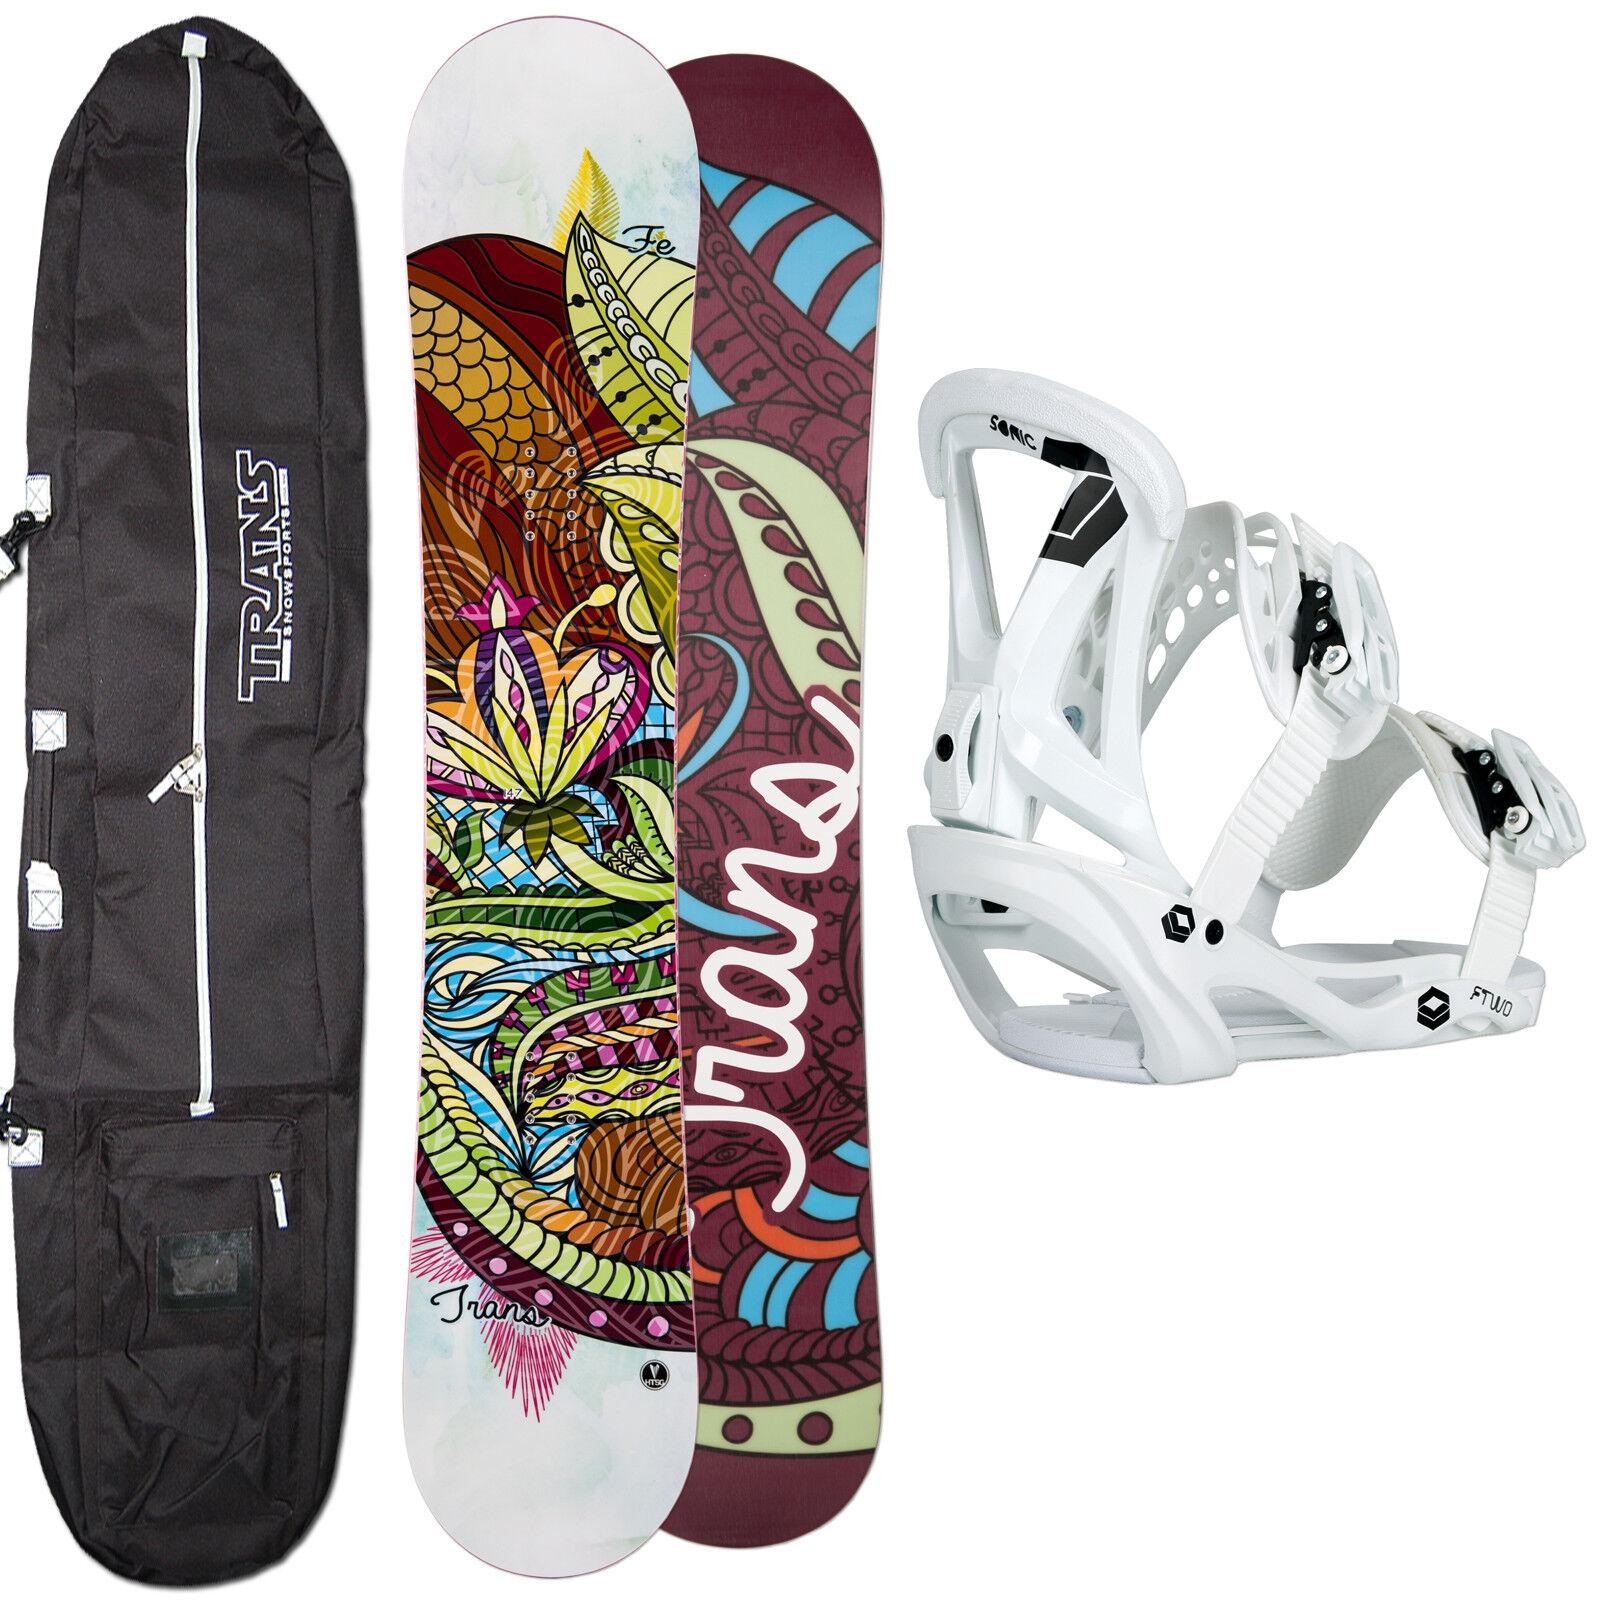 Snowboard Mujer Set Fe Trans blanco 136cm 2019 + Ftwo Sonic Fijación M + Bag